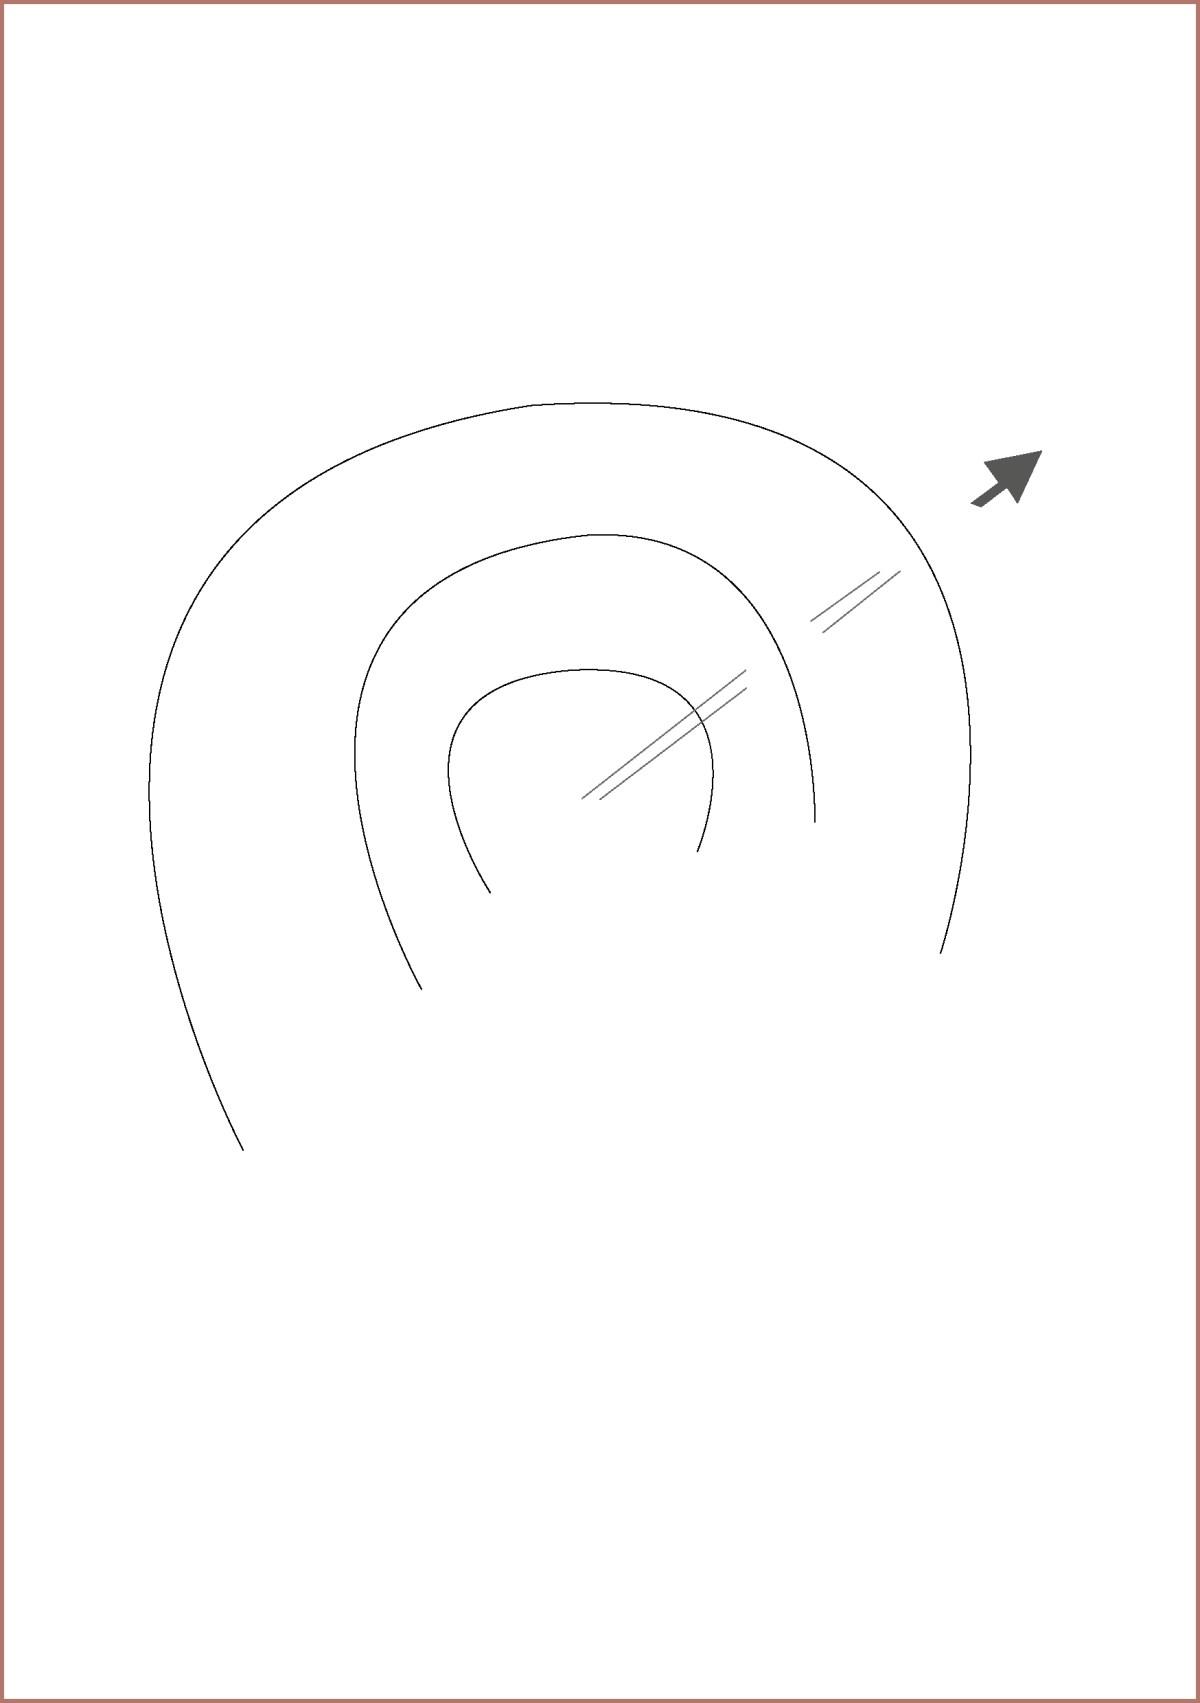 Dibujo Digital, las cosas infintas #12 de Fernanda Barreto